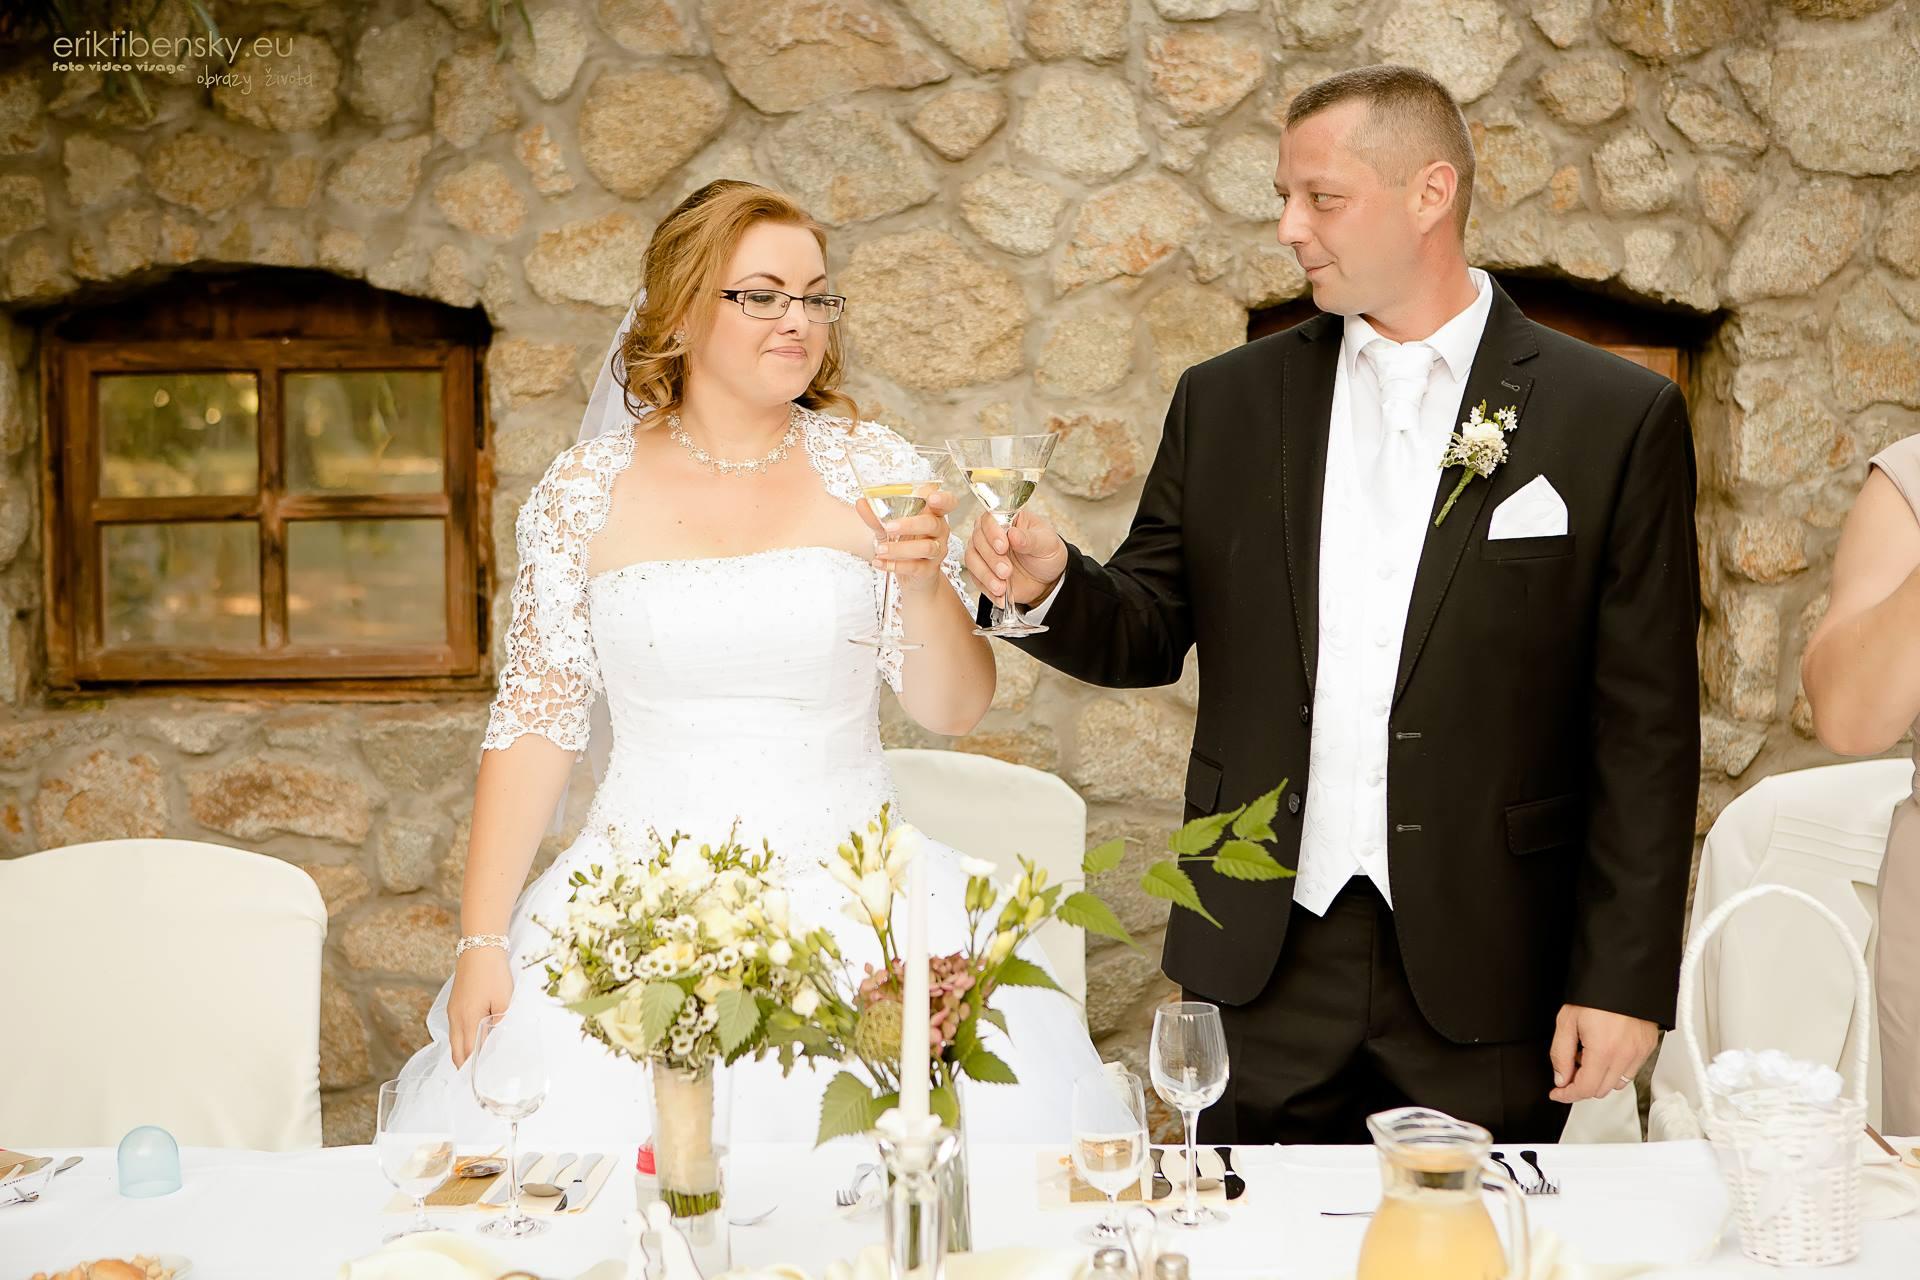 eriktibensky-eu-svadobny-fotograf-wedding-photographer-3037